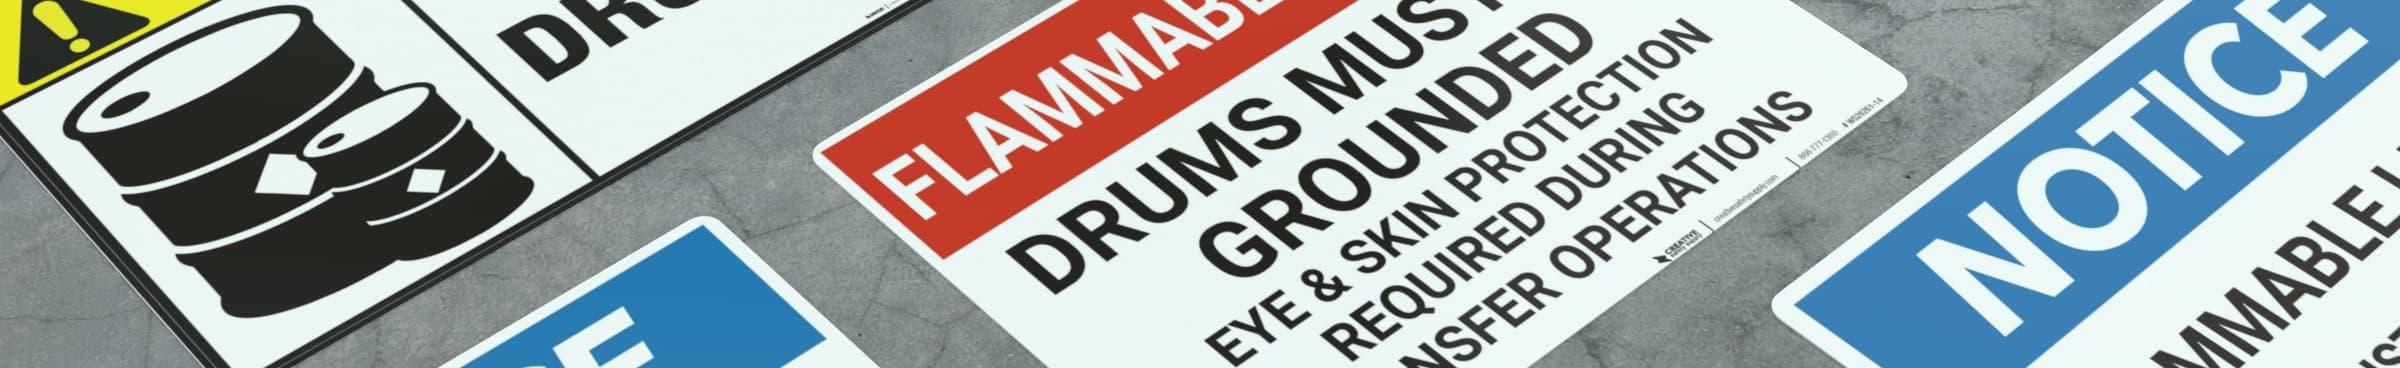 Drum Signs